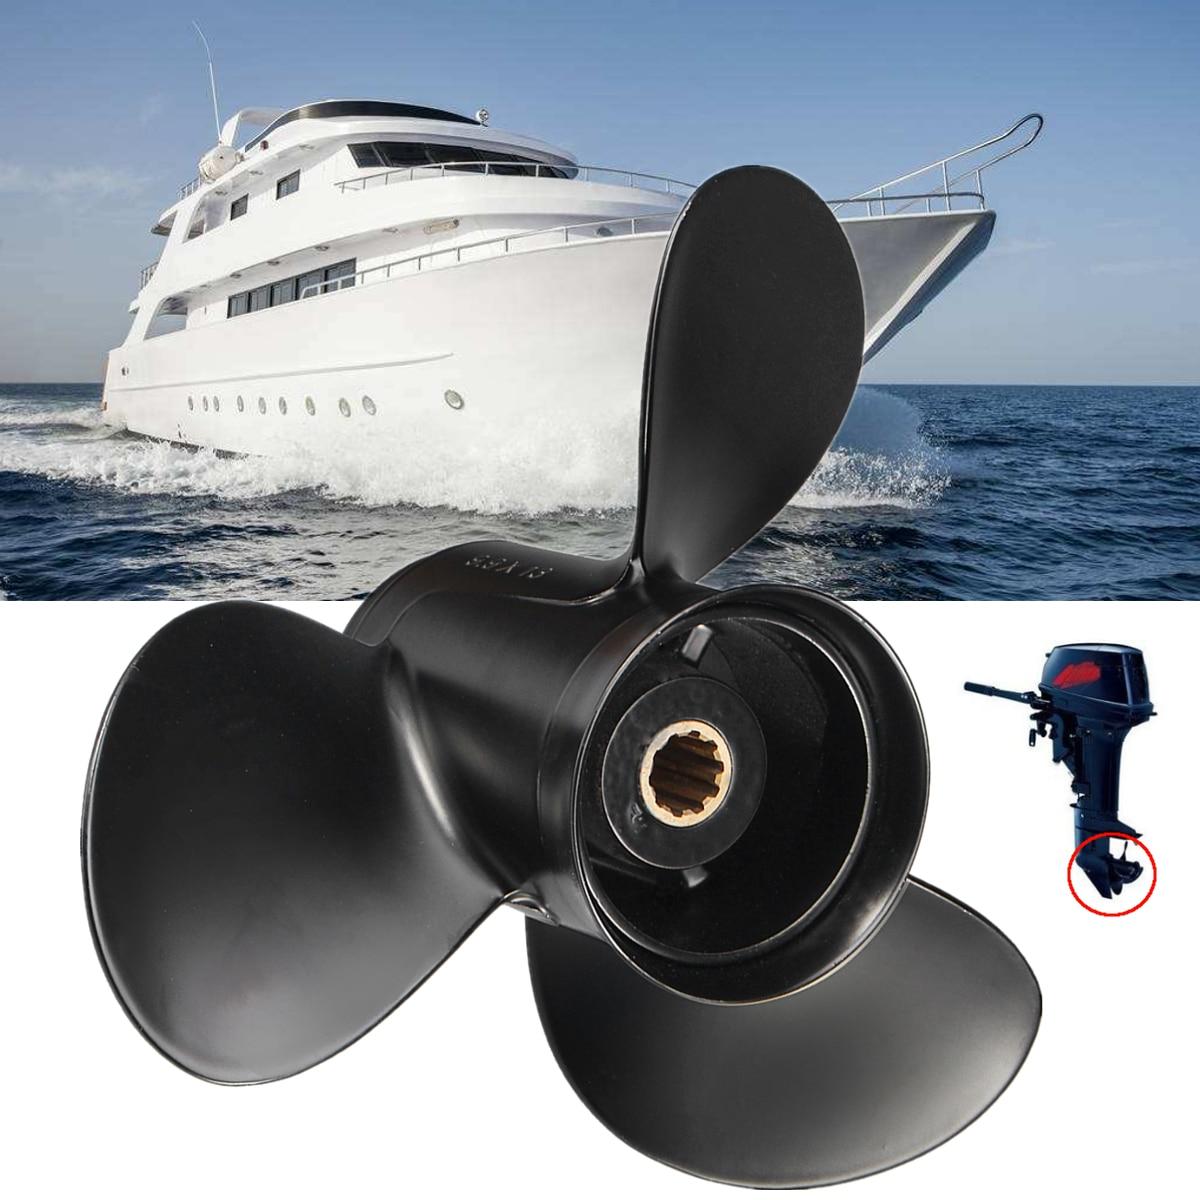 48-19640a40 hélice de popa do barco da liga de alumínio 9.9x13 mariner para o motor de mercúrio 25-30hp preto 13 dente spline 3 lâminas